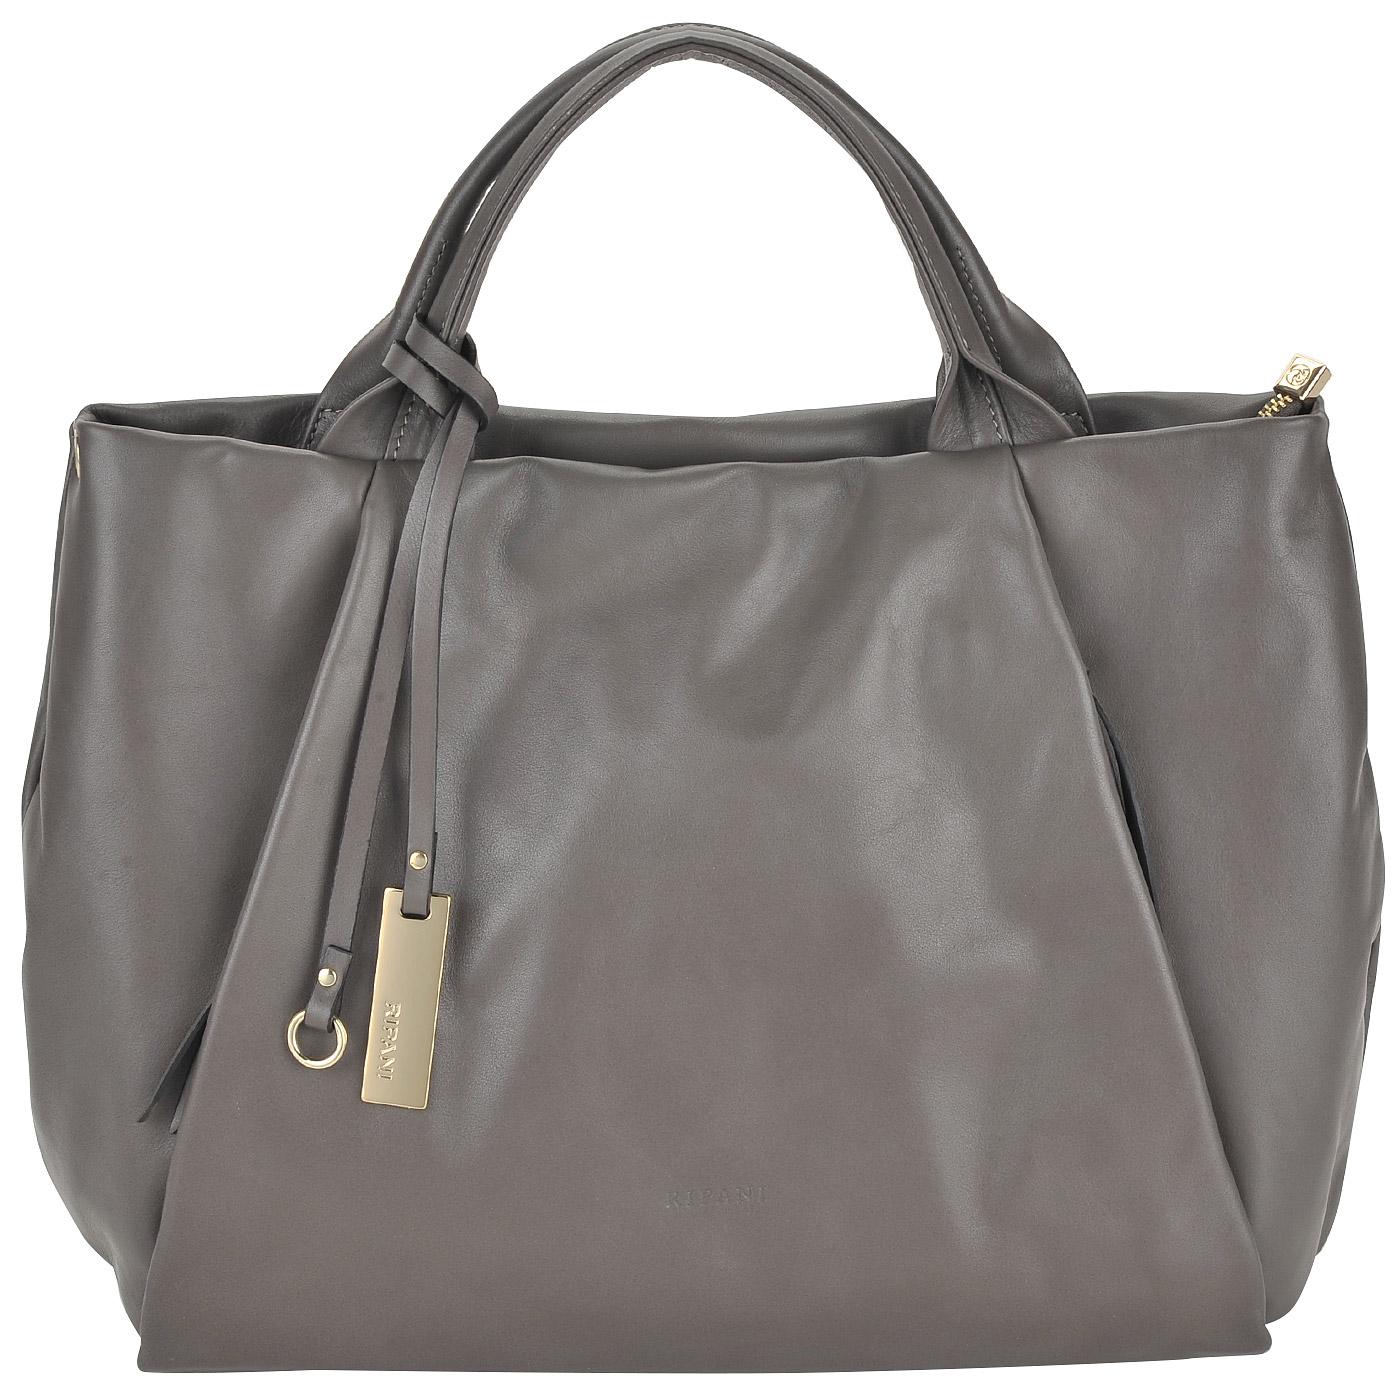 543511ce473e Женская серая сумка из гладкой мягкой кожи Ripani Lime 7831LL.00042 ...